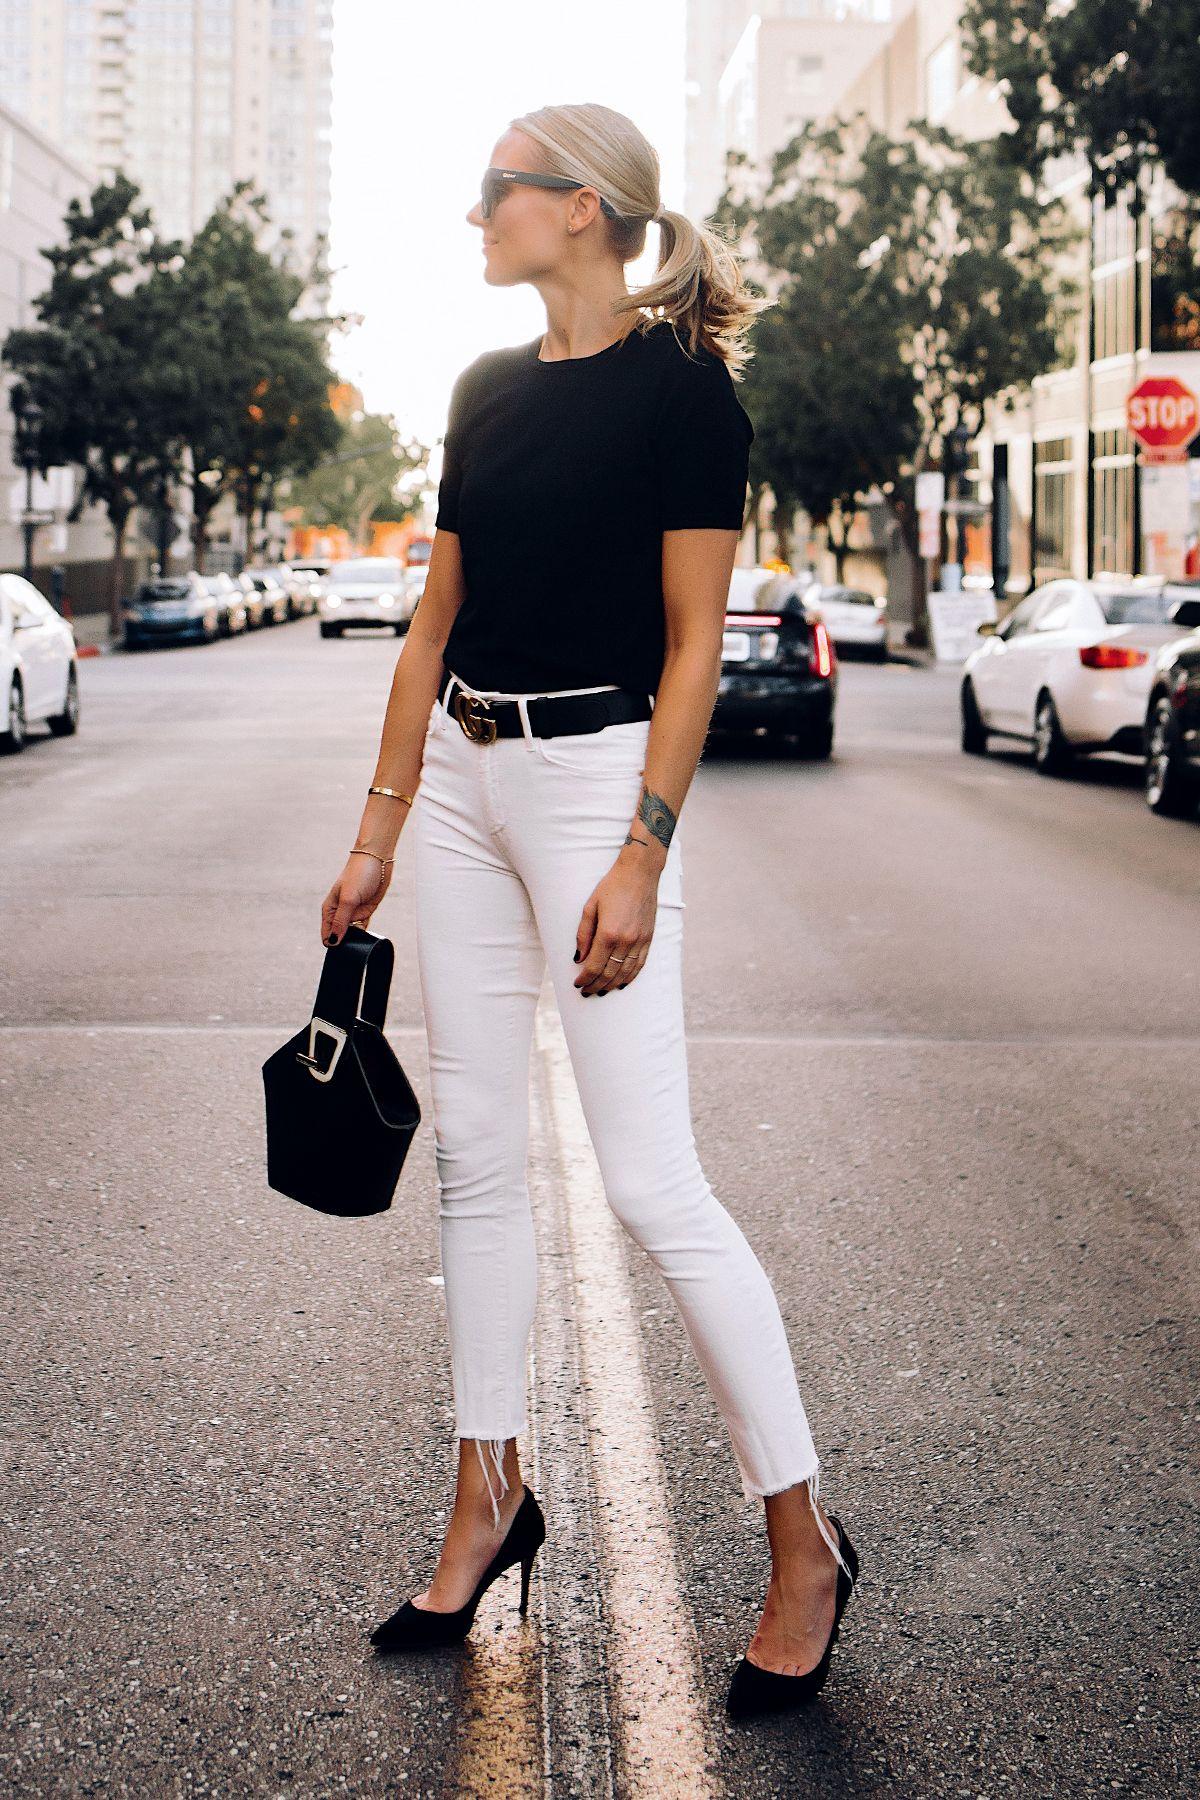 7bec875ecf6 Woman Wearing Black Short Sleeve Sweater Raw Hem White Skinny Jeans Black  Pumps Black Gucci Belt Black Bucket Bag Fashion Jackson San Diego Fashion  Blogger ...